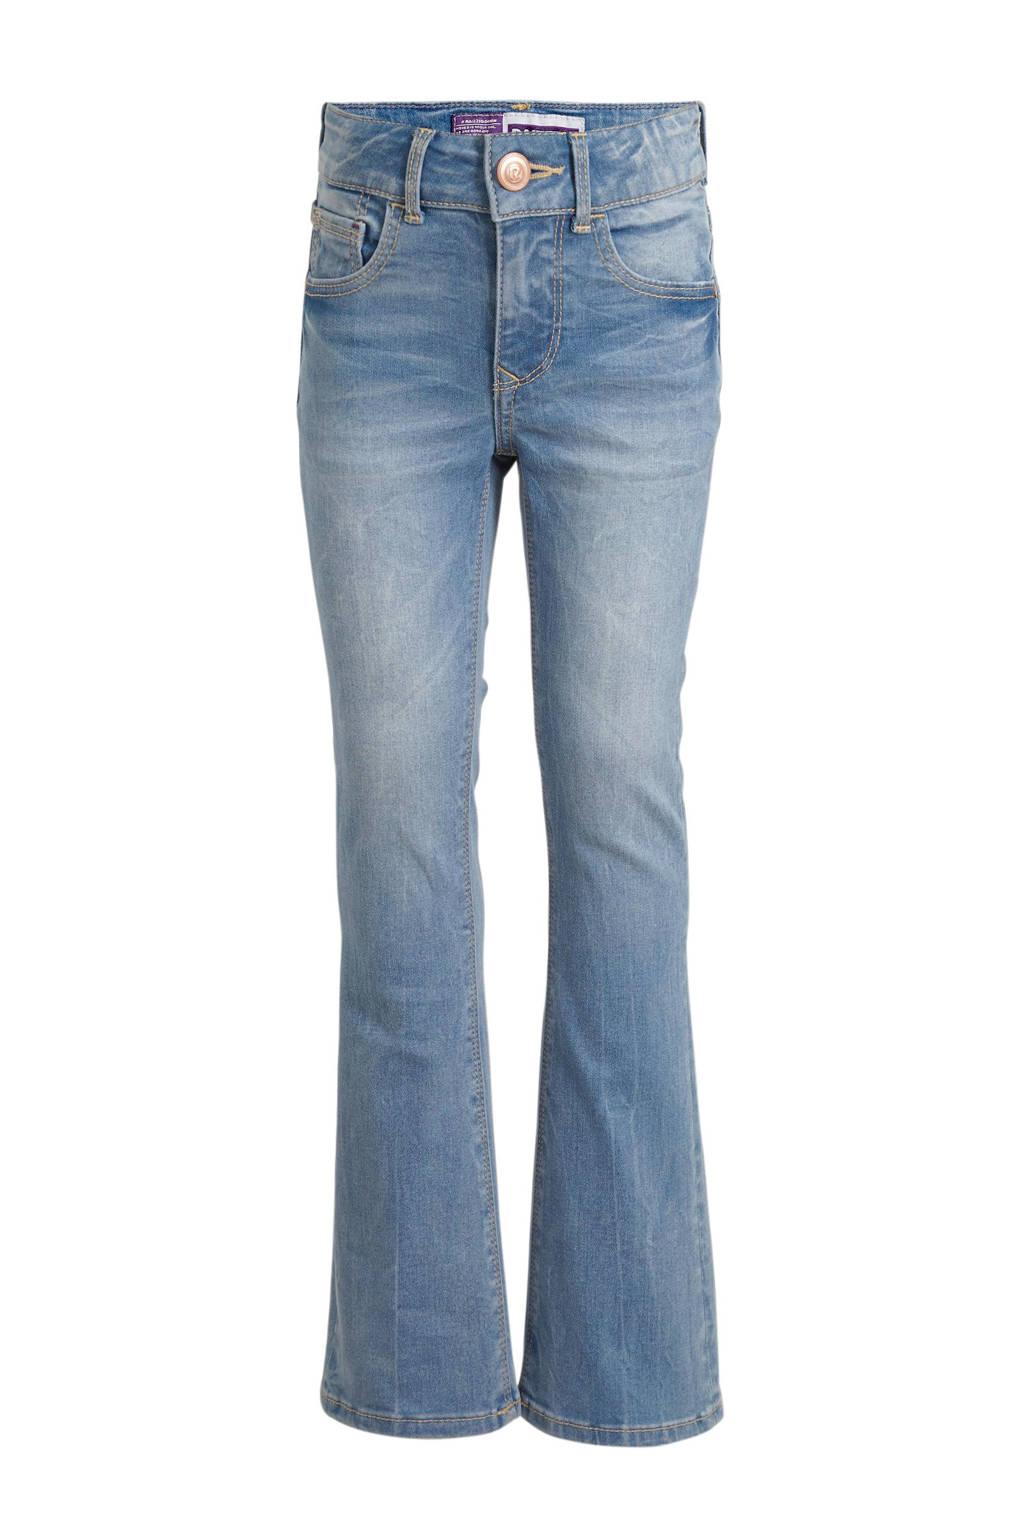 Raizzed high waist flared jeans Melbourne light denim, Light denim